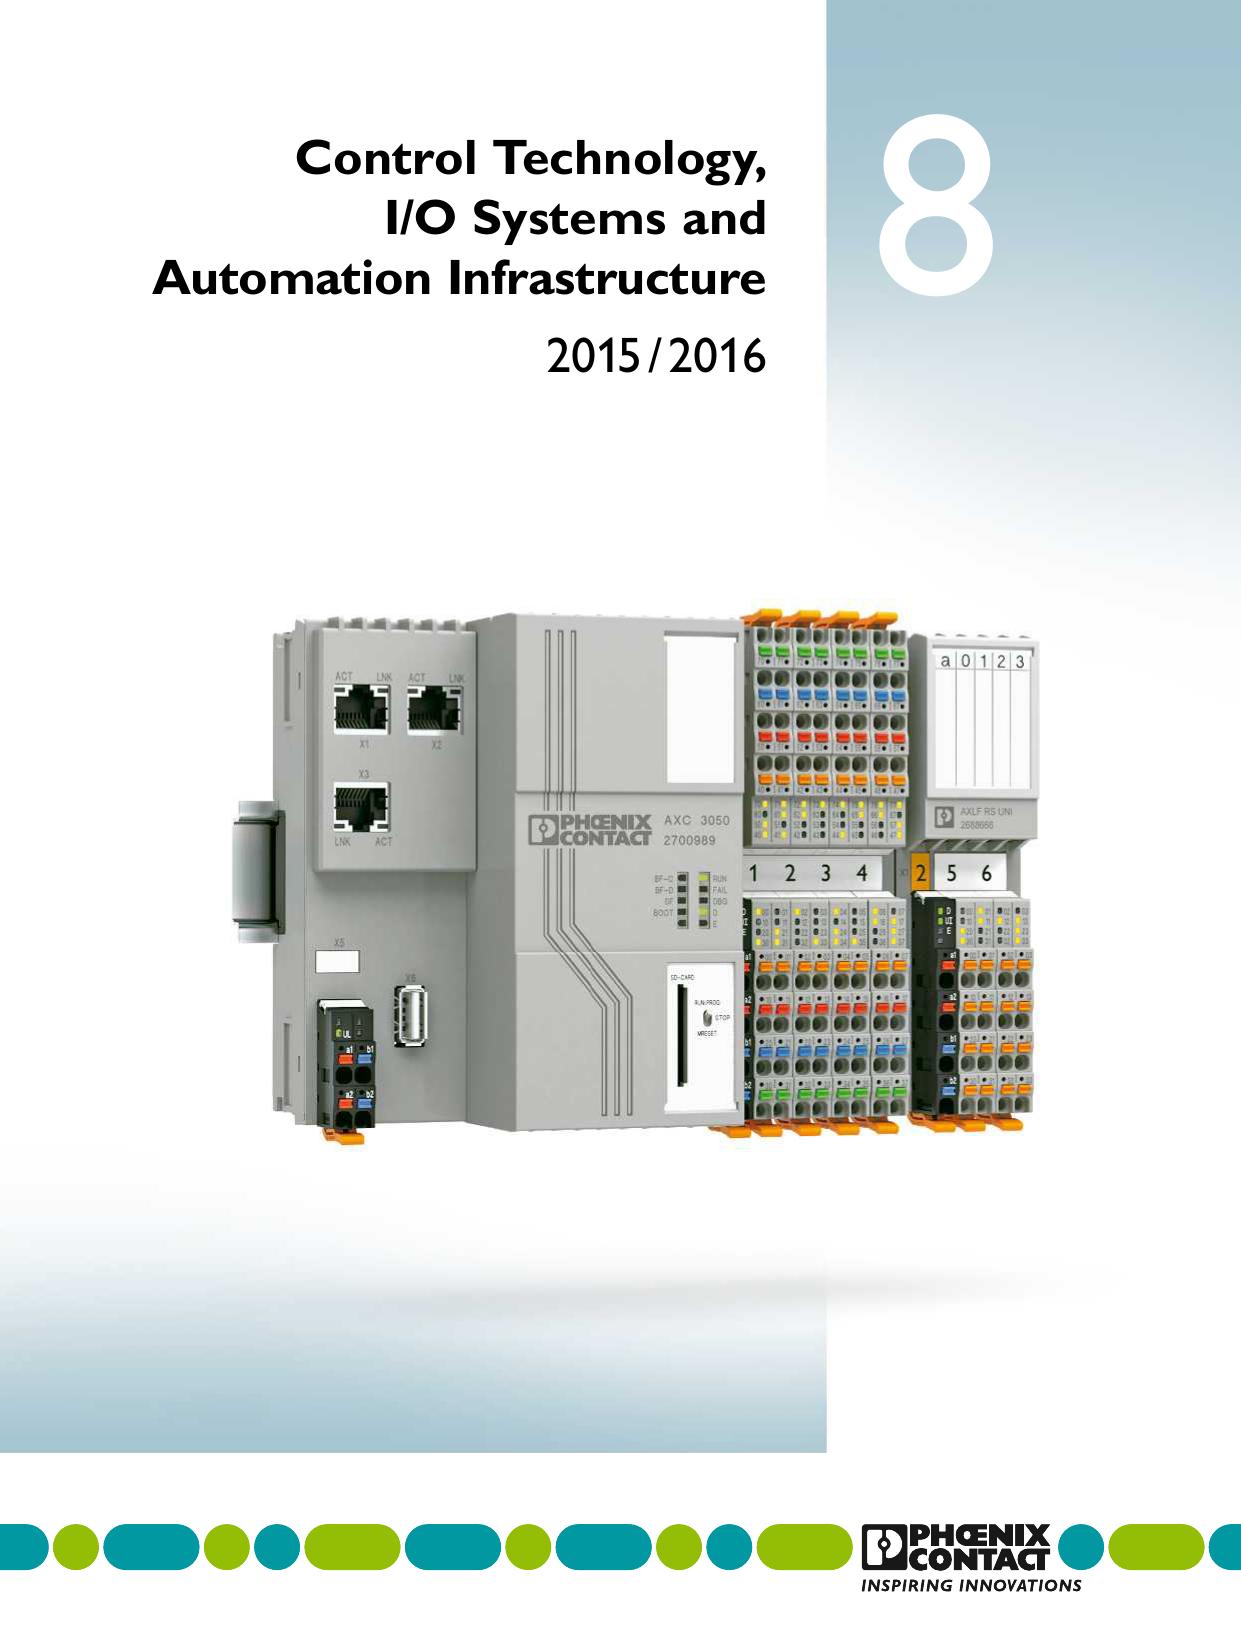 Phoenix Contact Audio Spectrum Analyzer Circuit 400led Electronics Projects Circuits